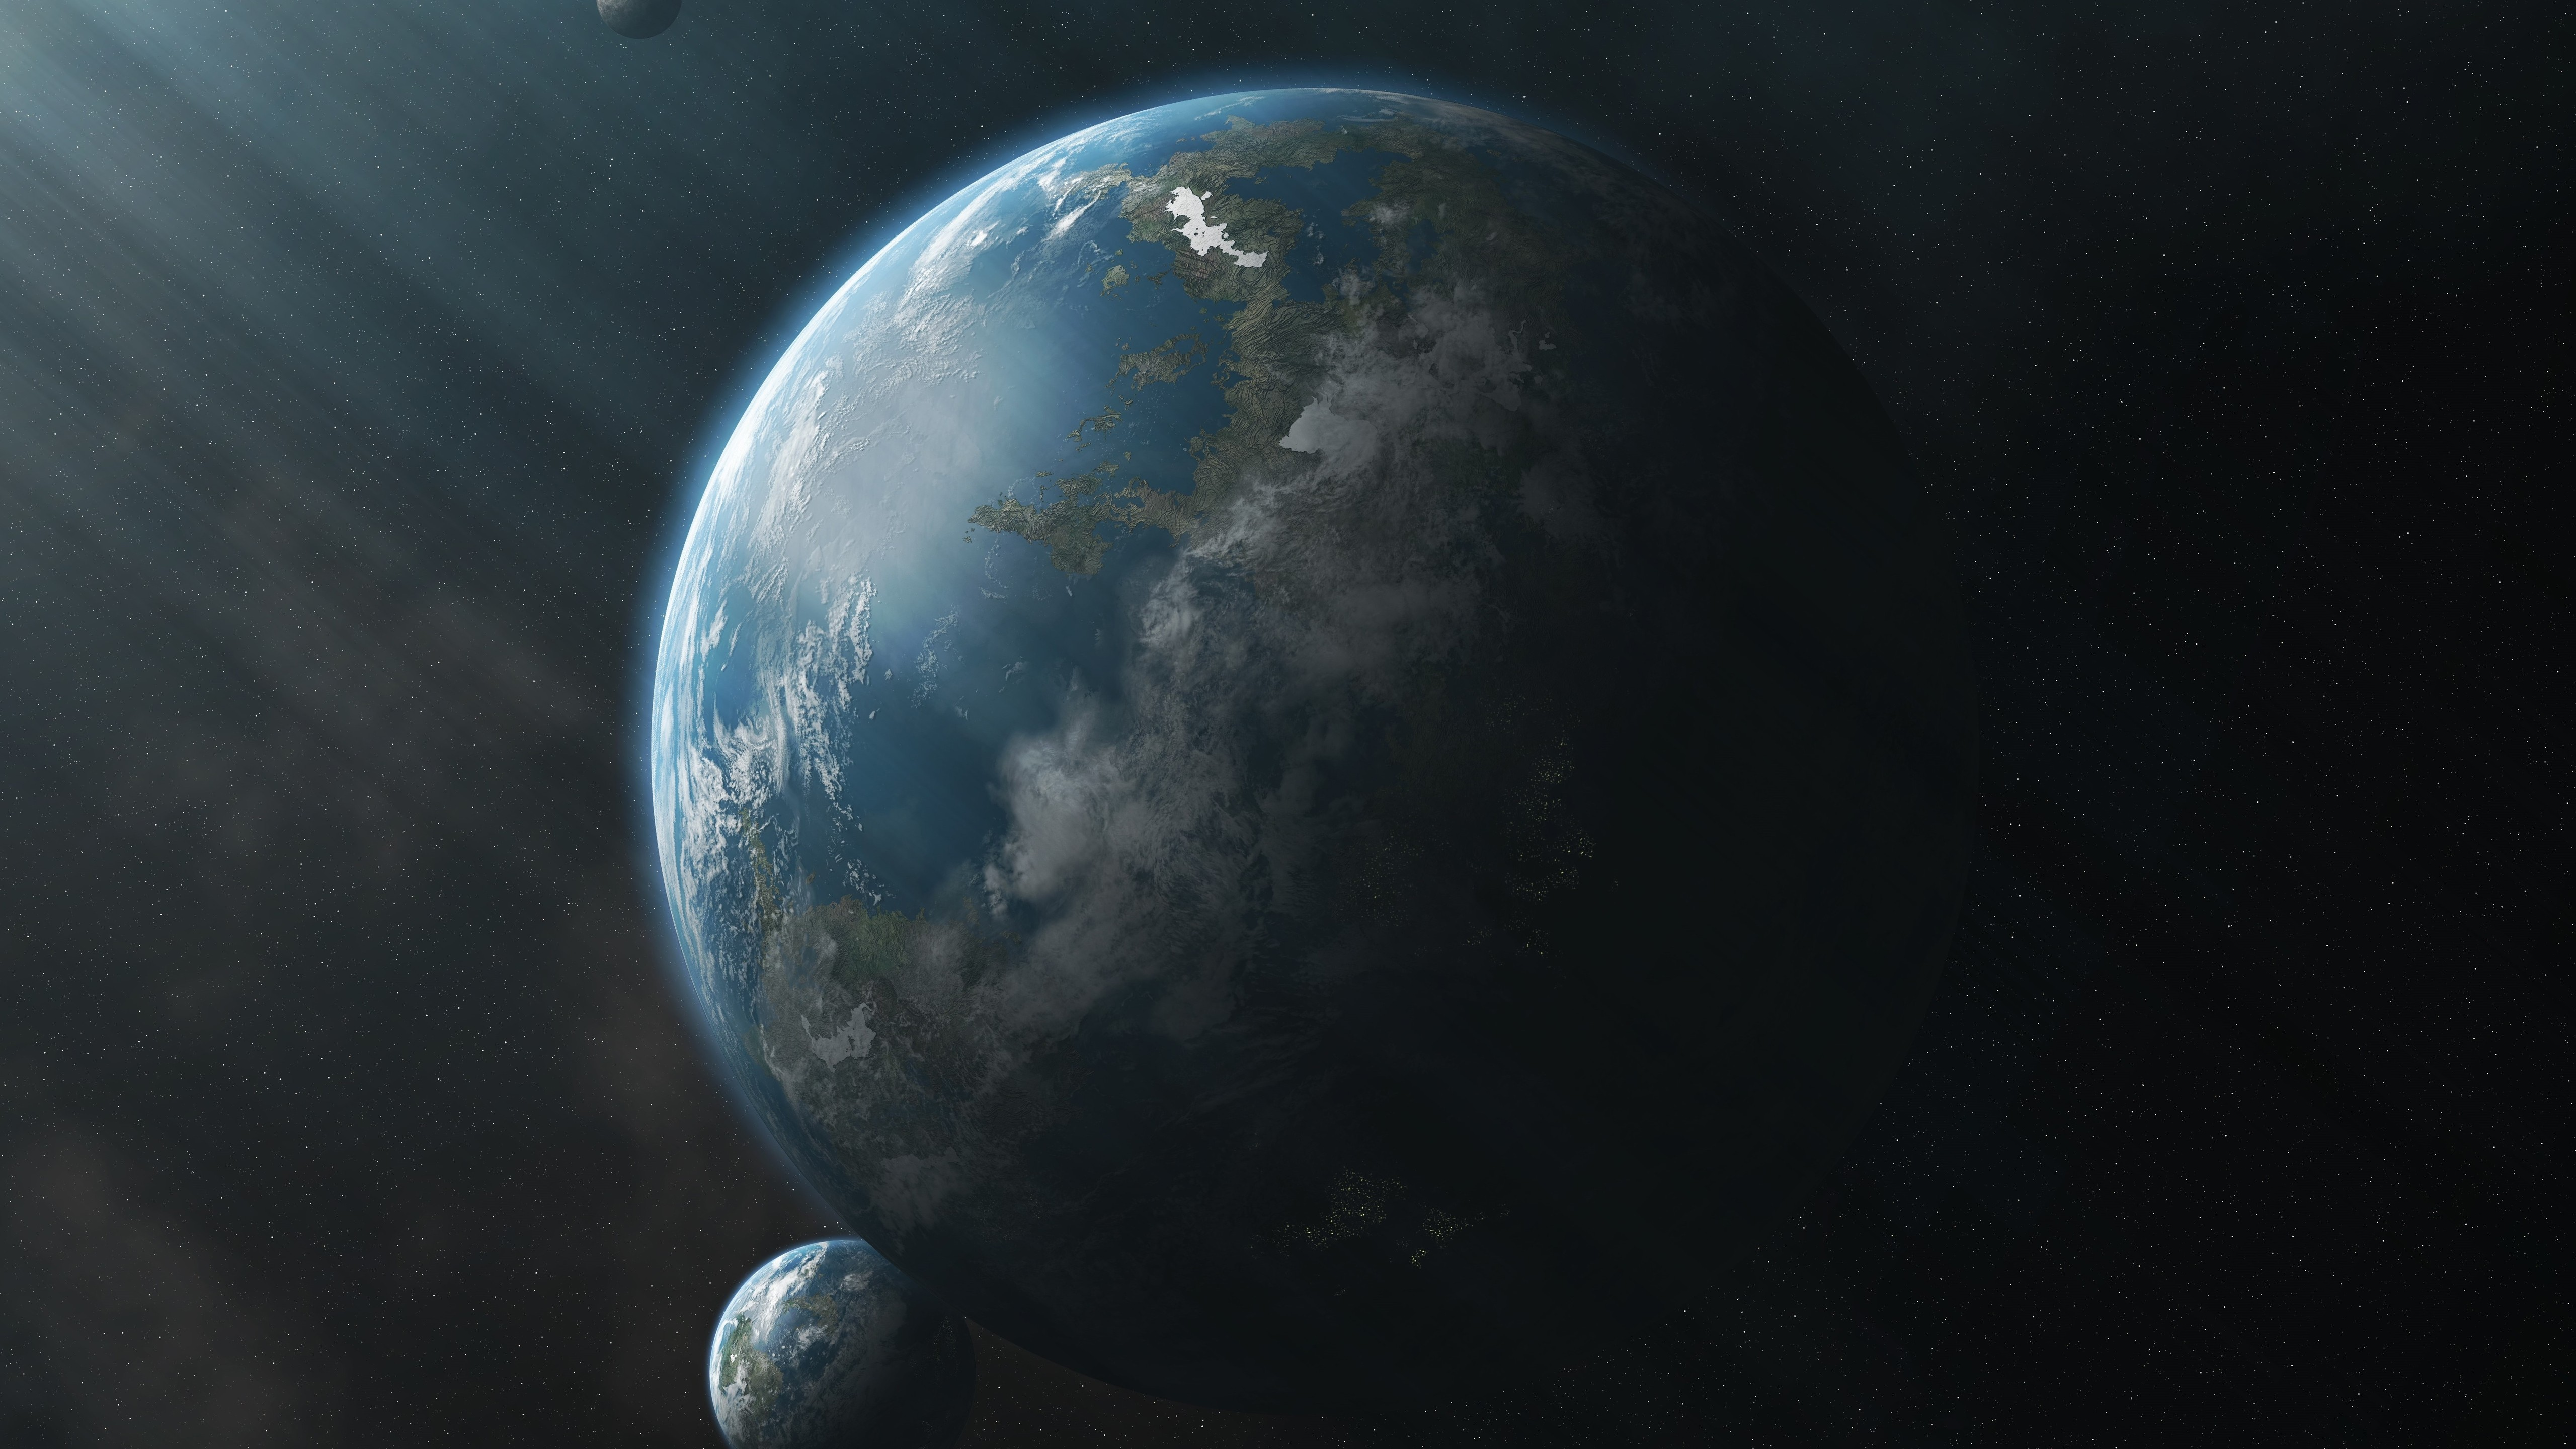 General 5120x2880 space planet sun rays render space art digital art Yavin (Star Wars)